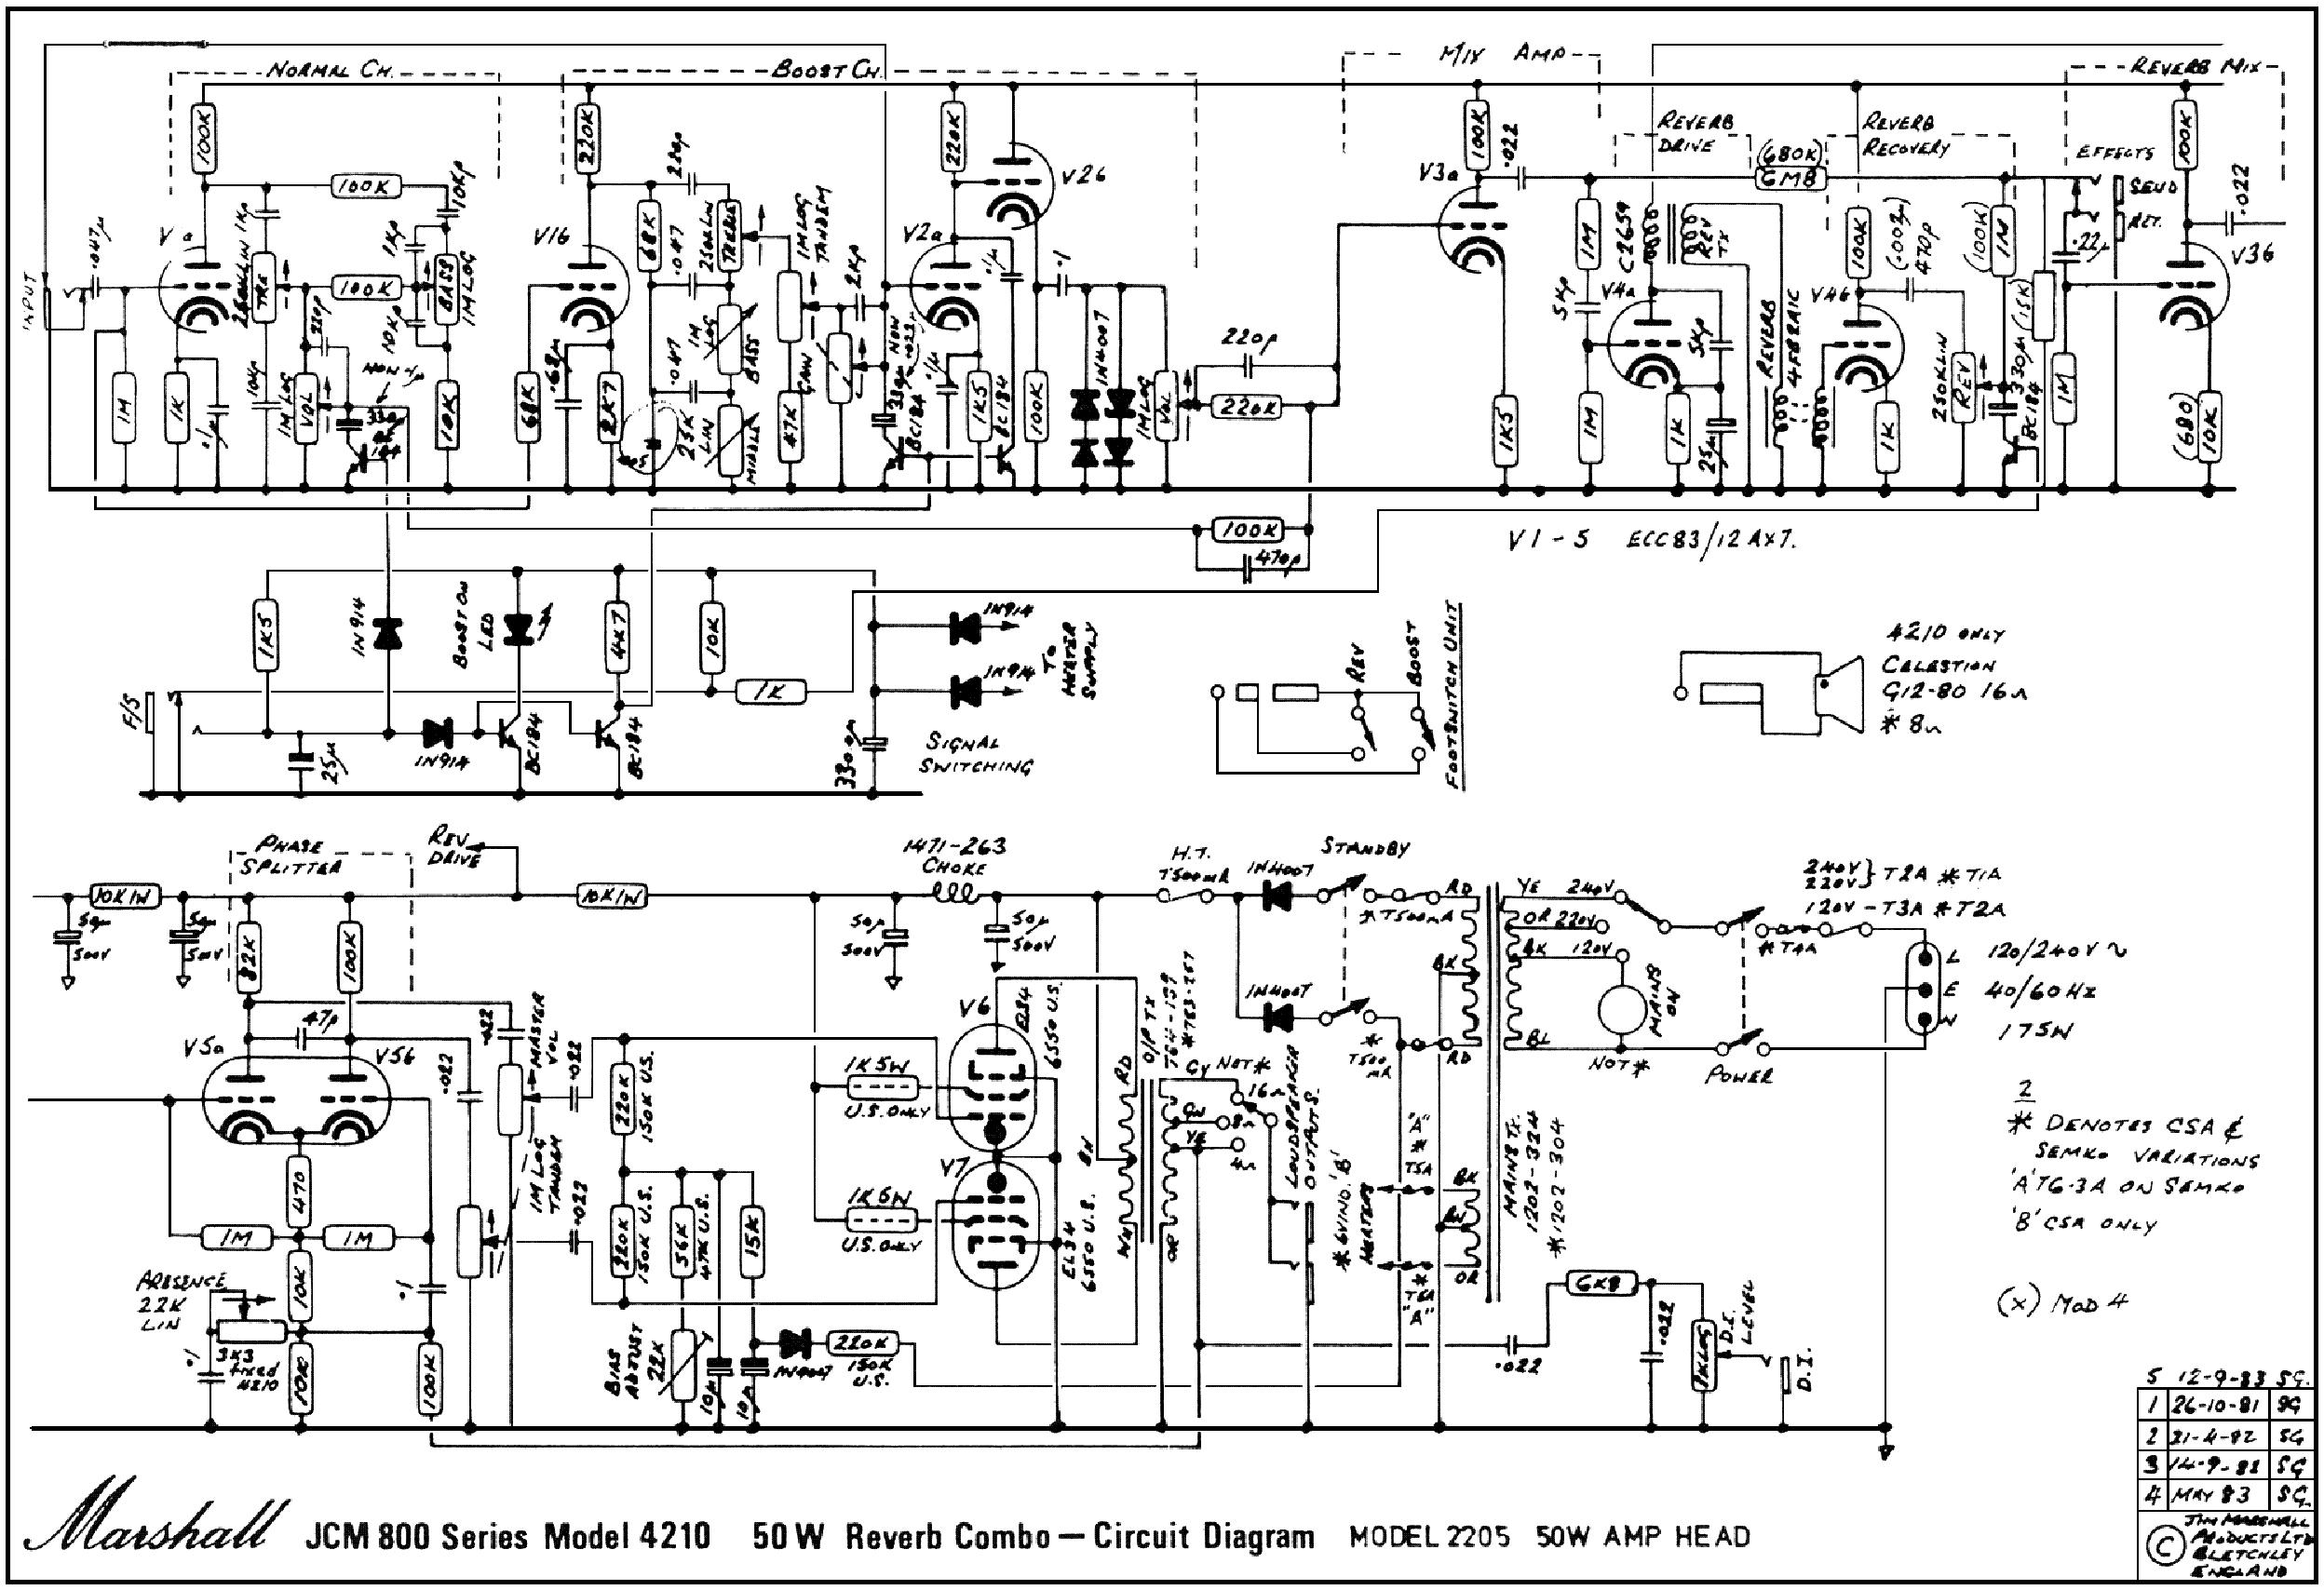 marshall jcm800 splitch rev 50w 4210 service manual